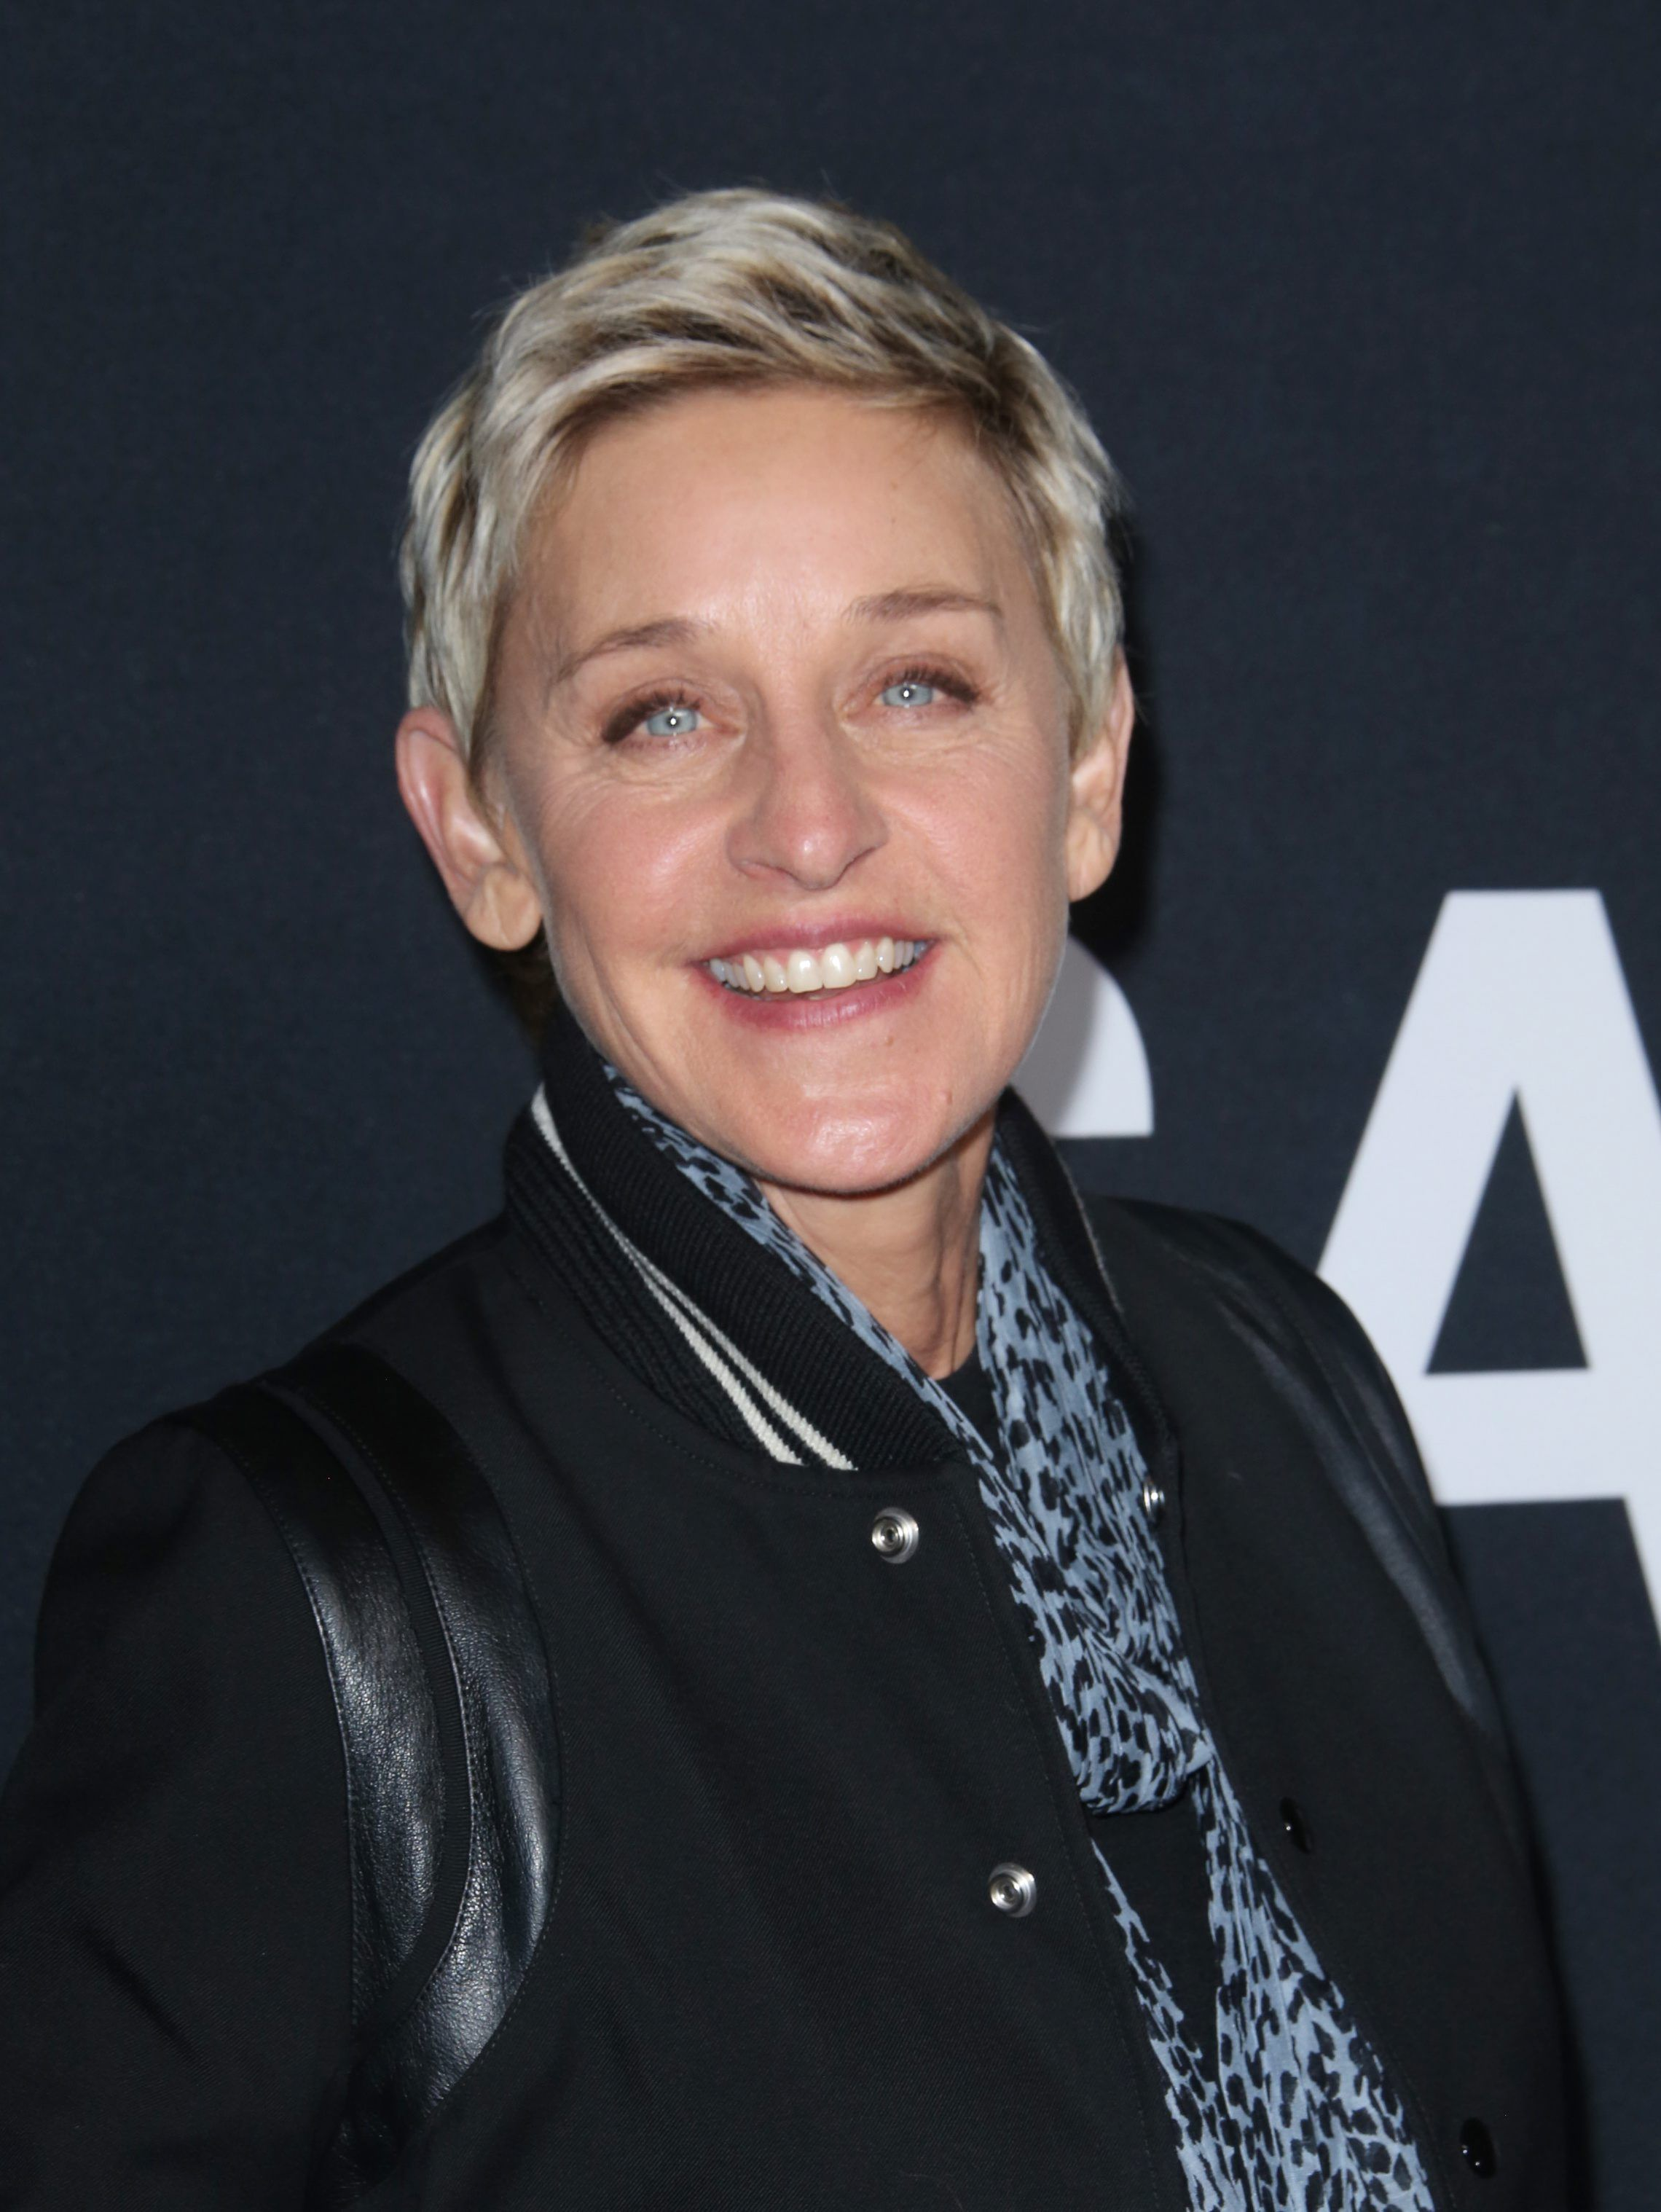 10 Ellen DeGeneres Pranks That Will Make You Laugh Out Loud - Fame10